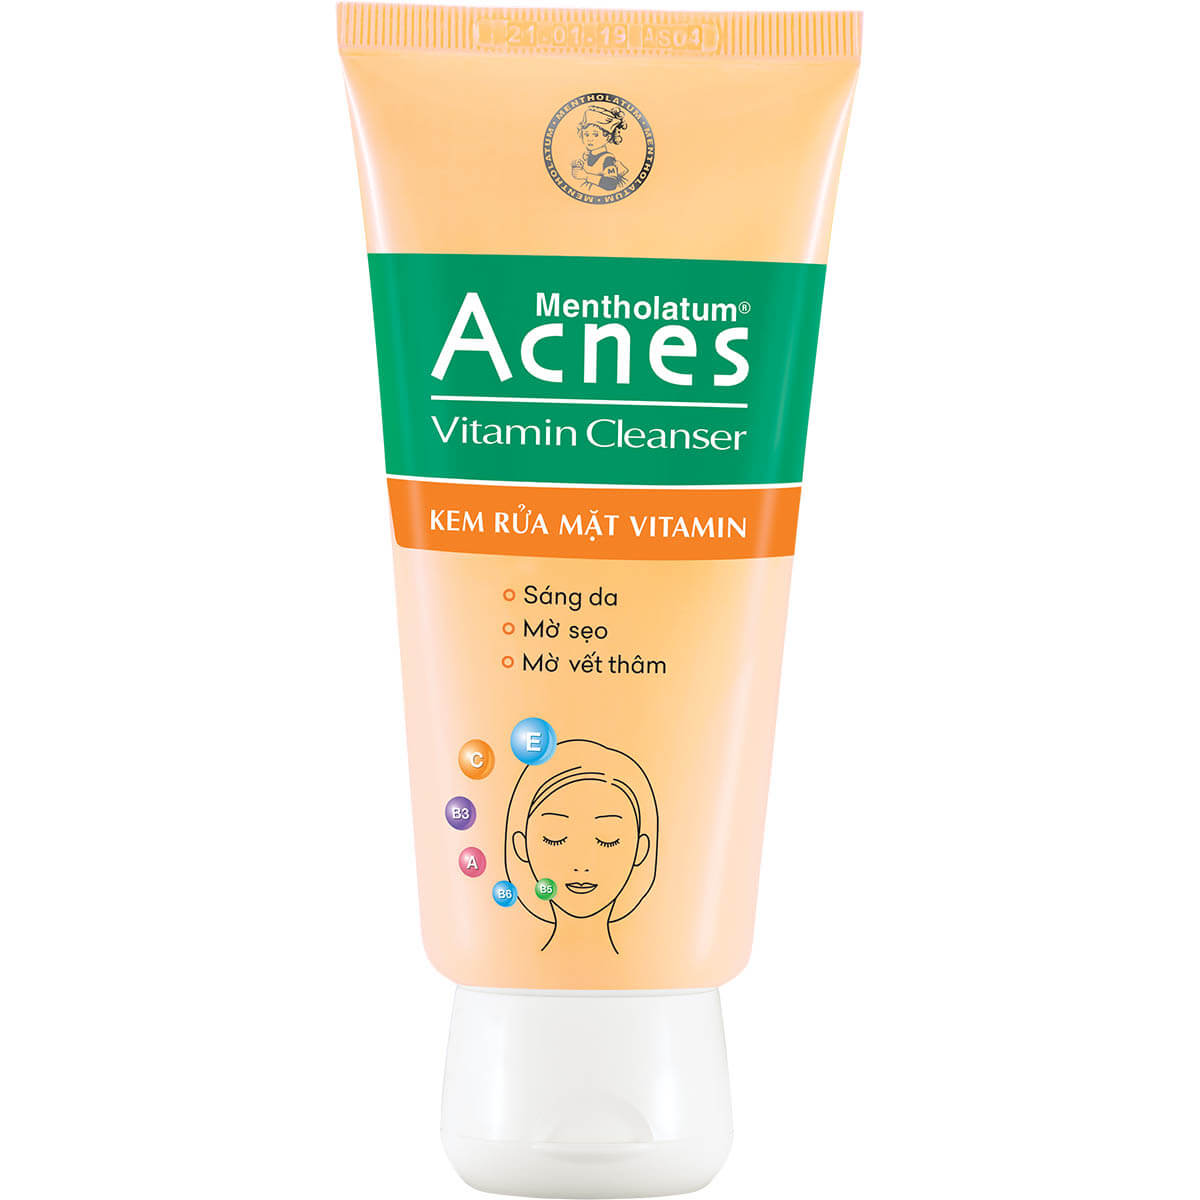 Sữa rửa mặt Acnes Vitamin Cleanser tuýp 50g